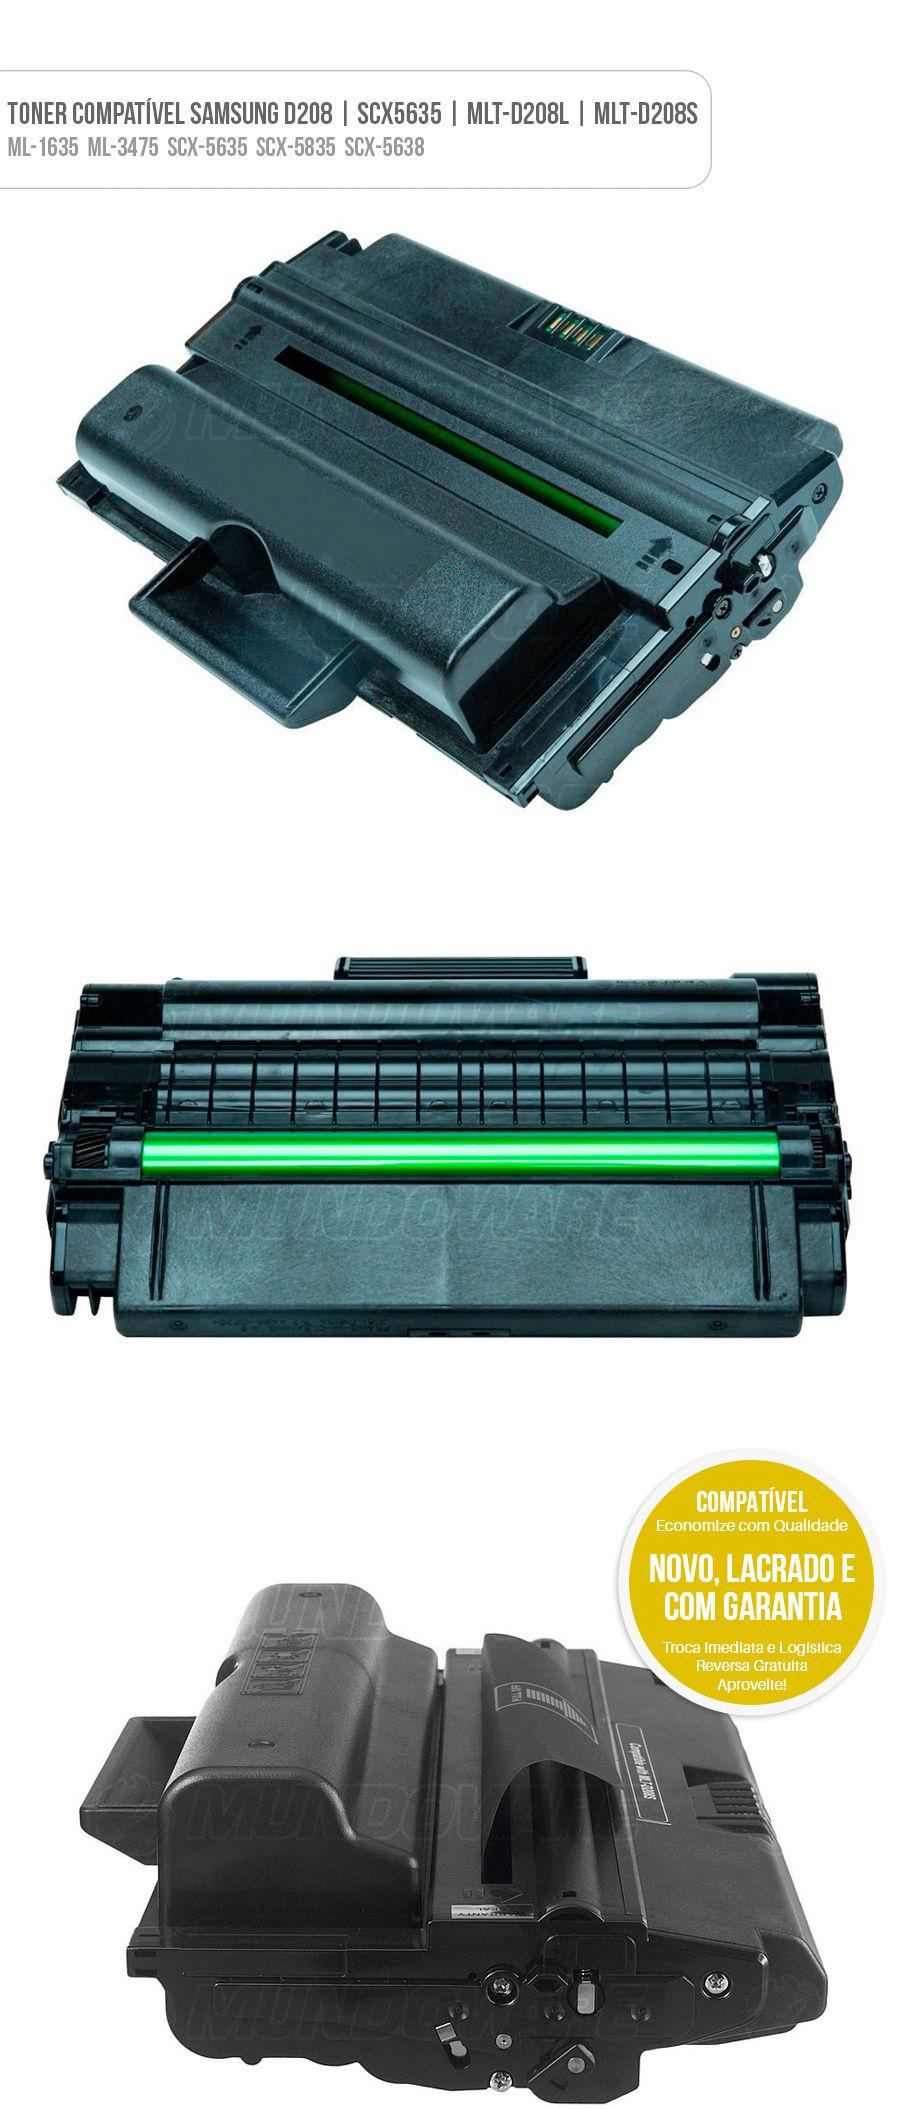 ML-1635 ML-3475 SCX-5635 SCX-5835 SCX-5638 Tonner para impressora laser